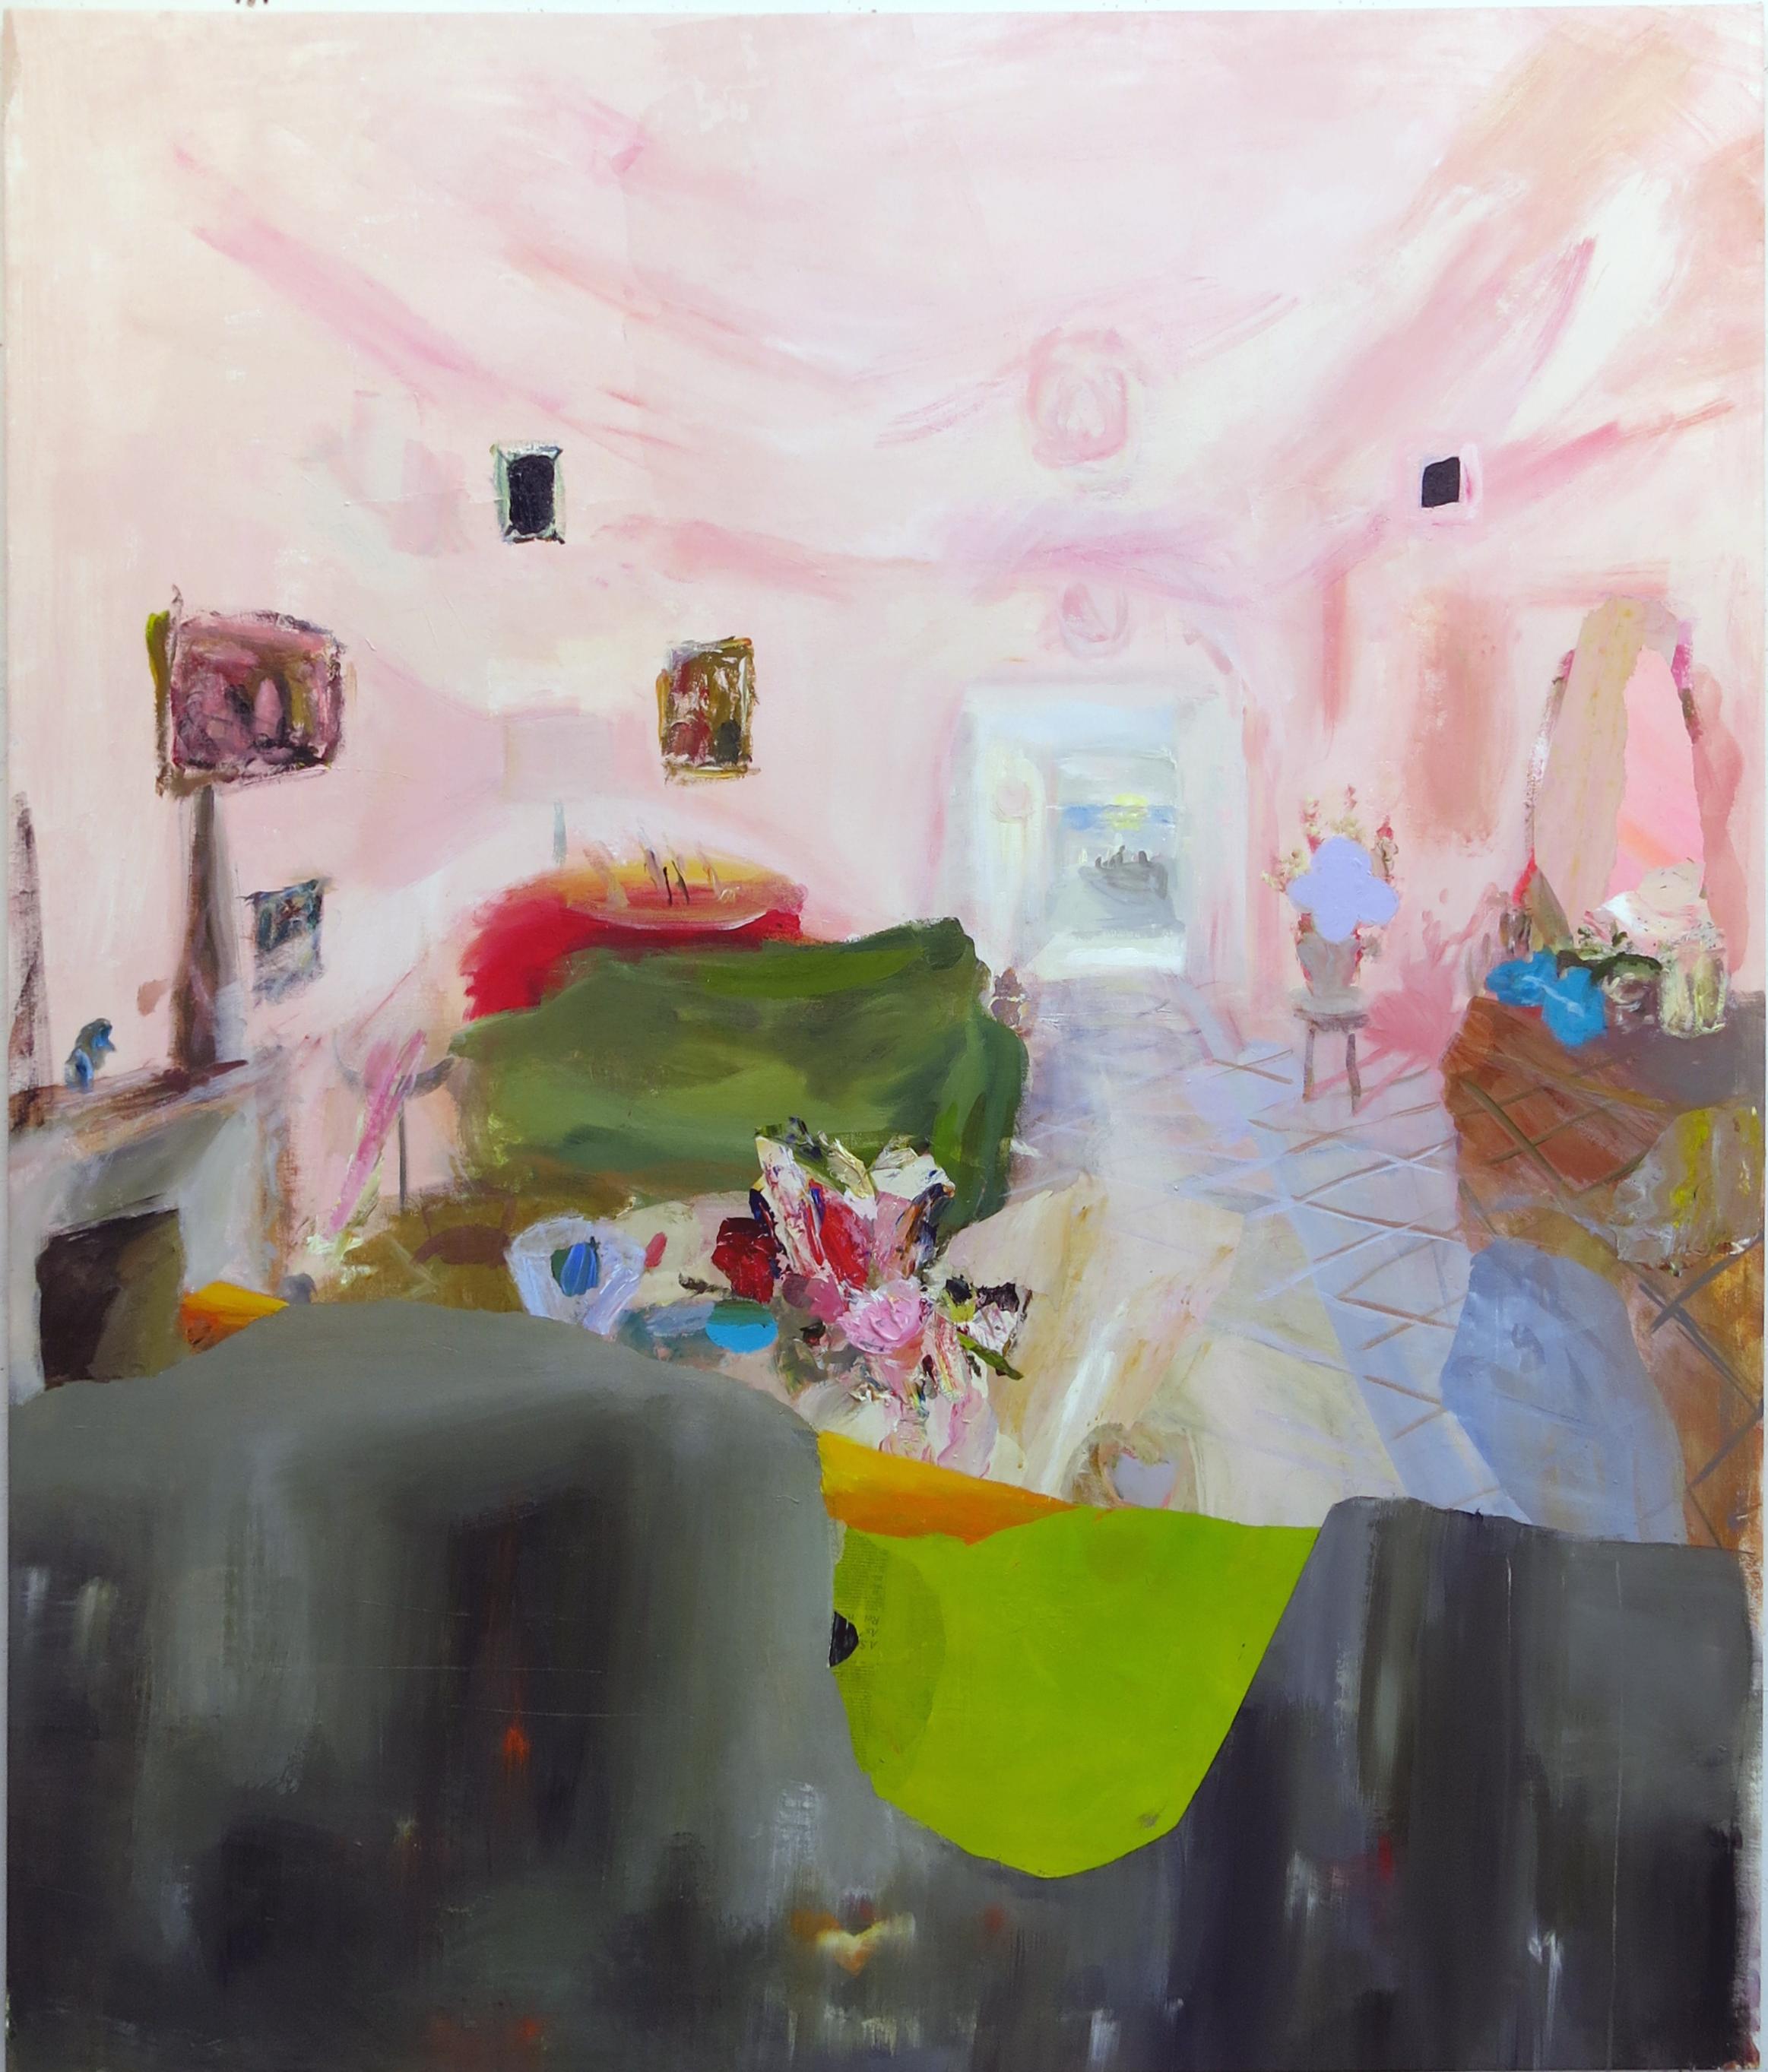 Judith Simonian, Fleshy Pink Room, 2014, acrylic on canvas, 72h x 60.25w in.